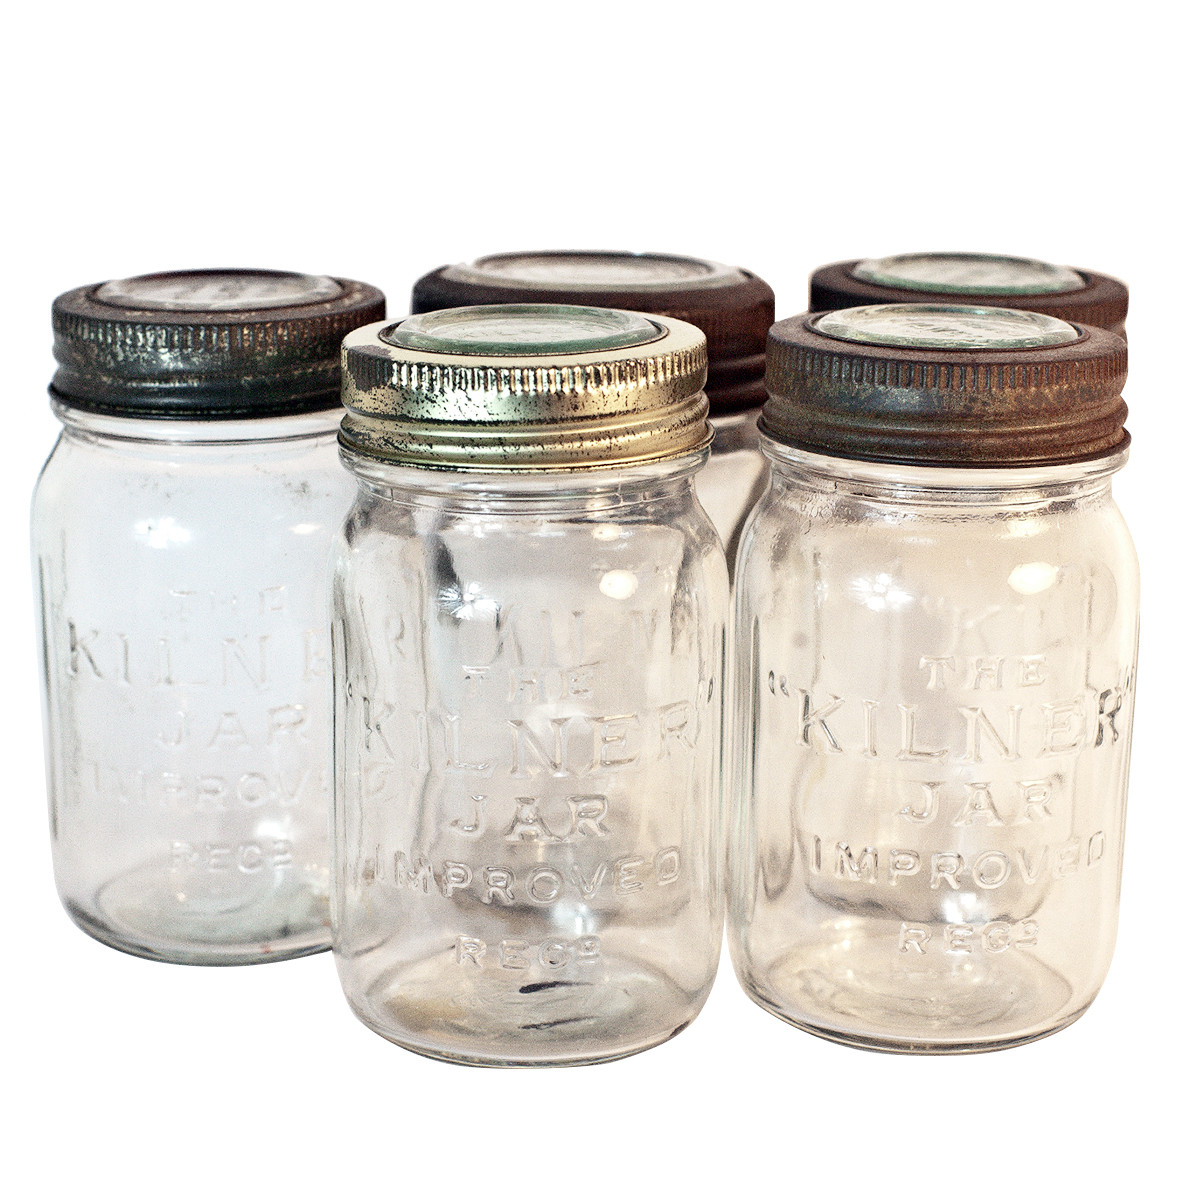 Vintage Kilner Jar Set Of 5 by In with the Old.png